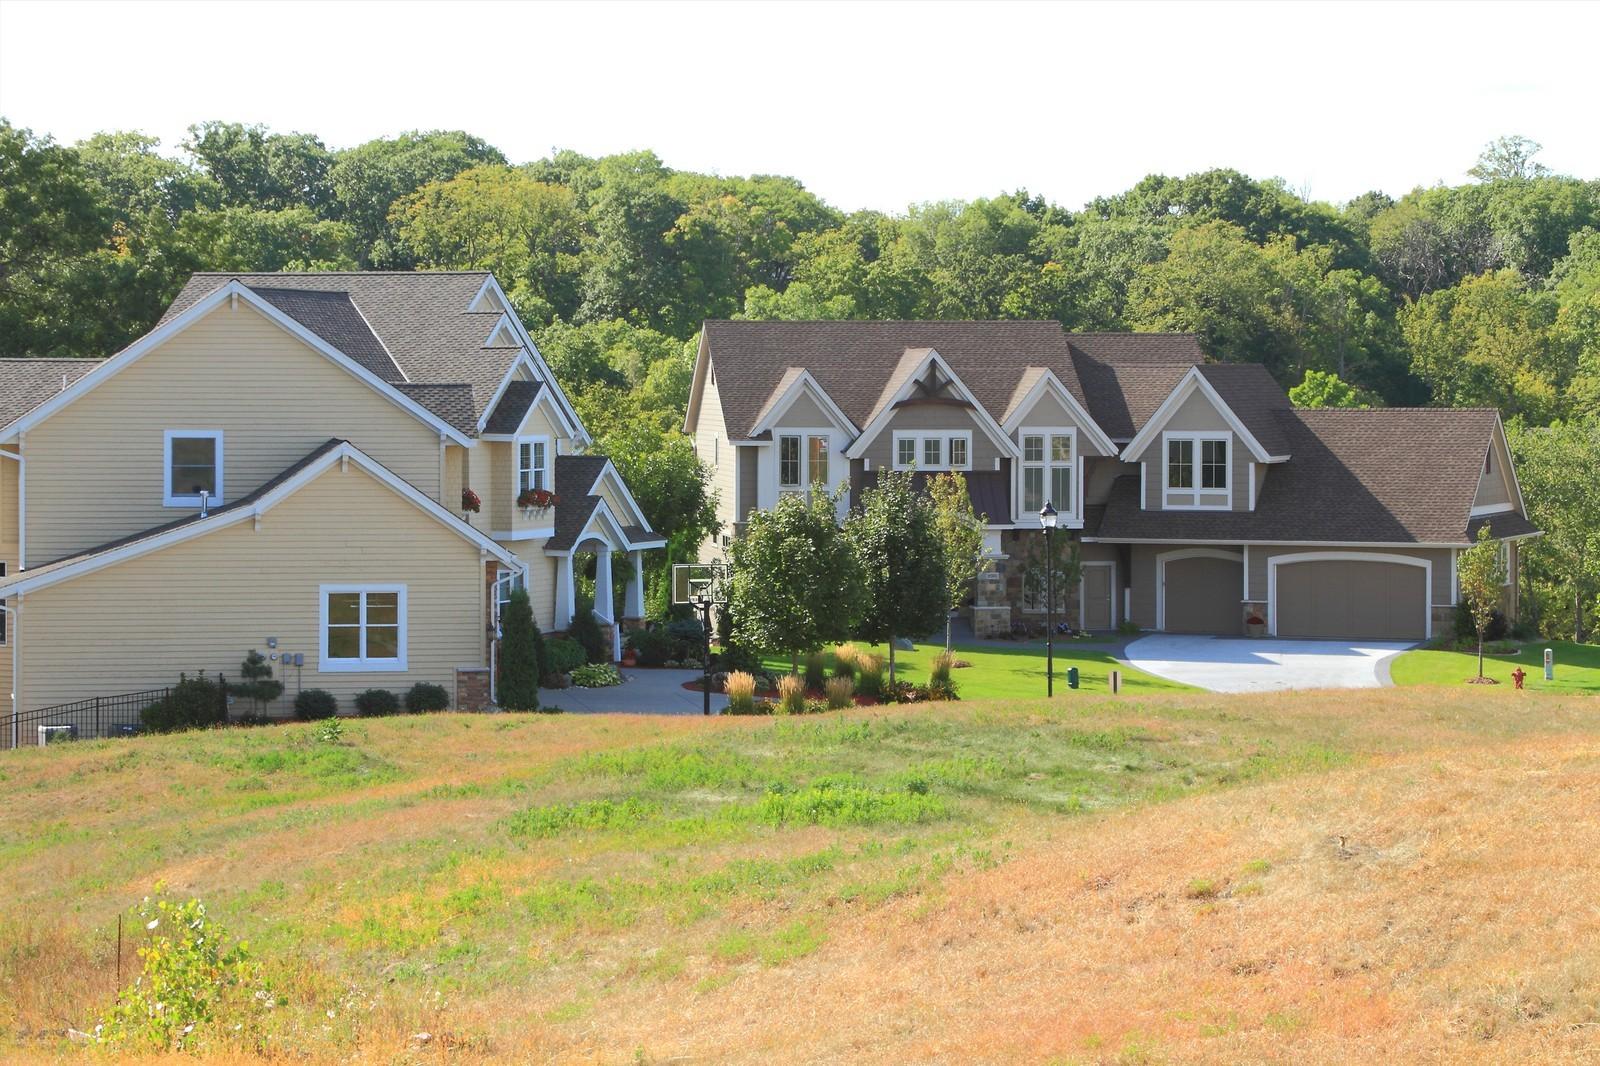 Real Estate Photography - 9627 Sky Lane, Eden Prairie, MN, 55347 - Location 2